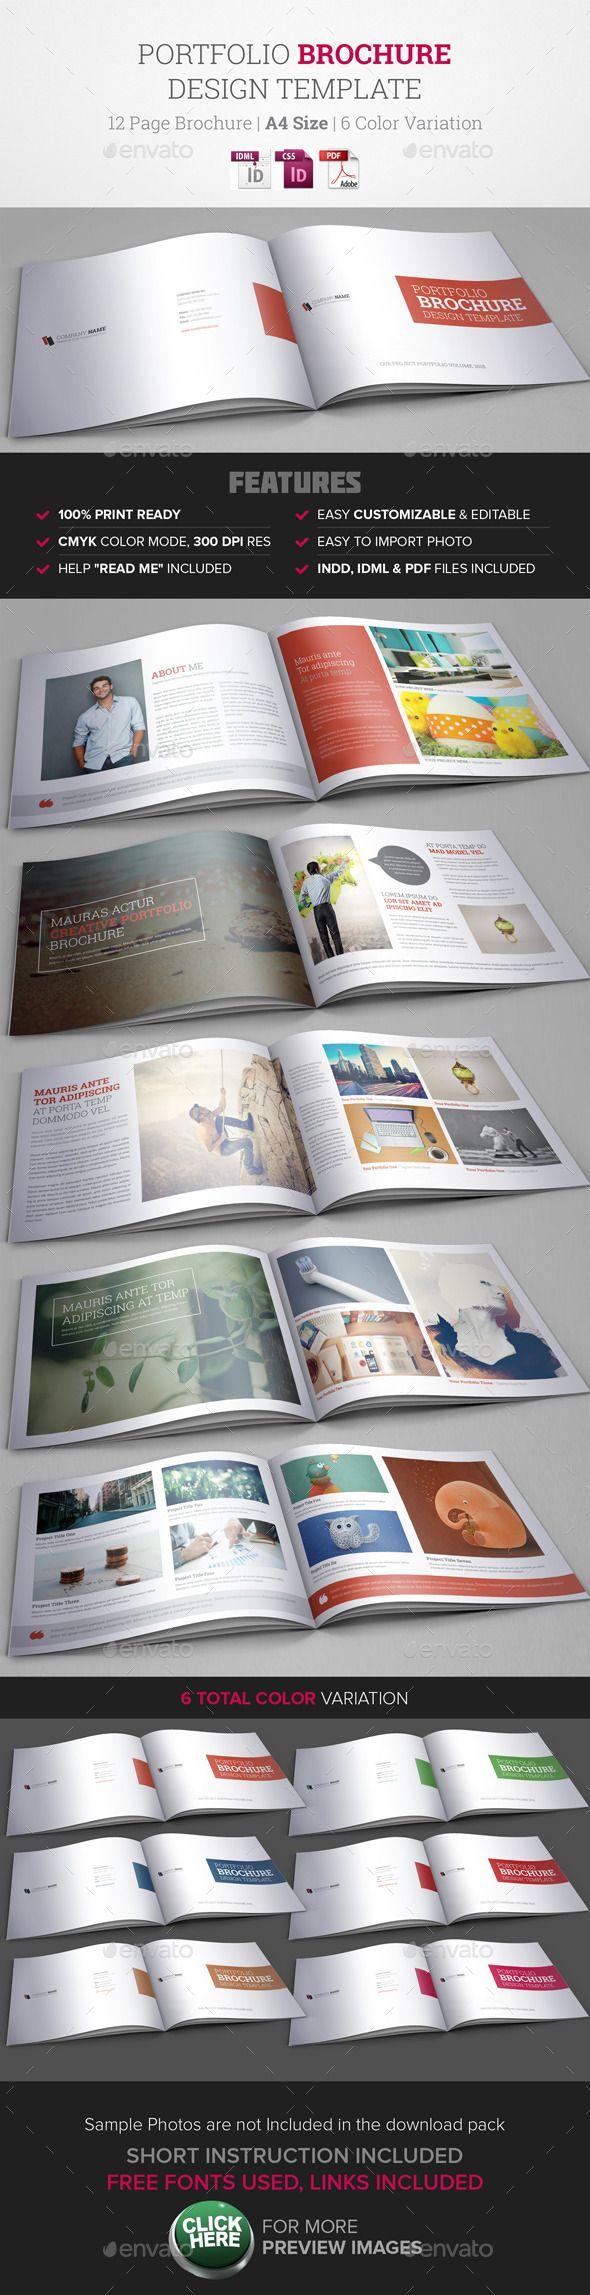 Portfolio Brochure InDesign Template #design #printtemplate Download: http://graphicriver.net/item/portfolio-brochure-indesign-template/9740942?ref=ksioks